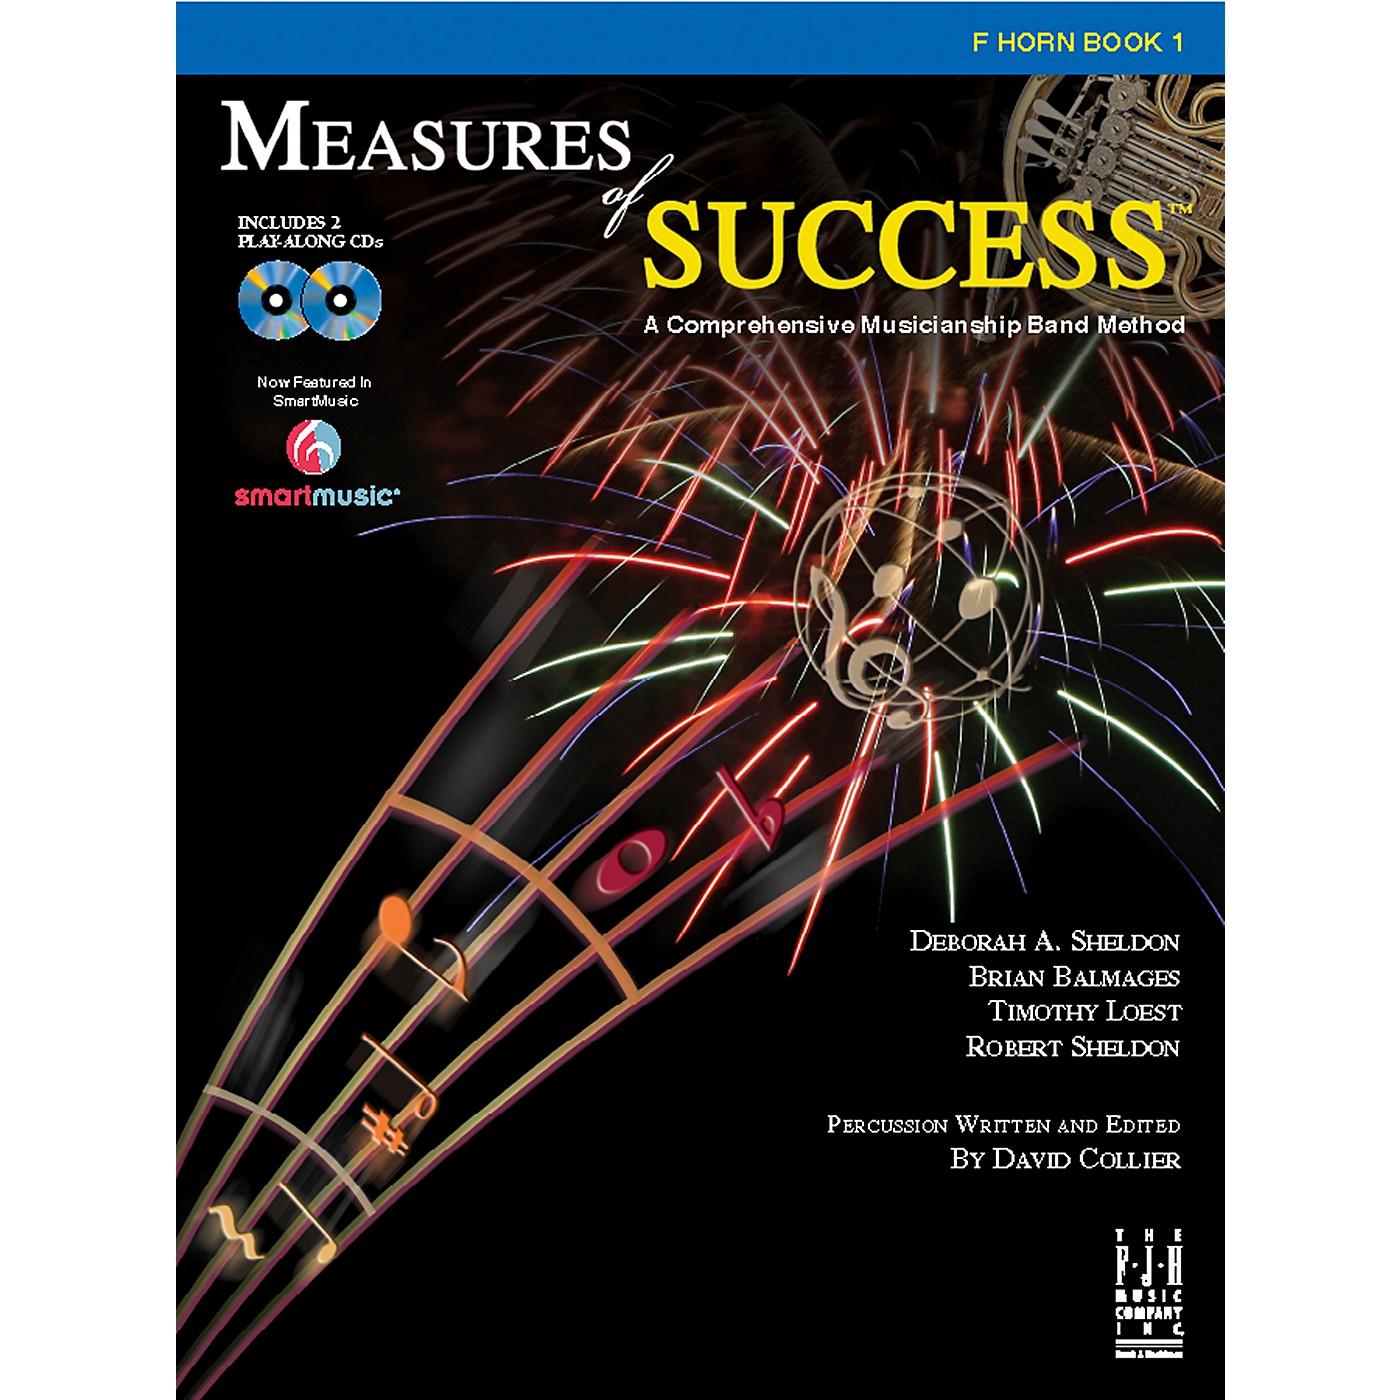 FJH Music Measures of Success F Horn Book 1 thumbnail